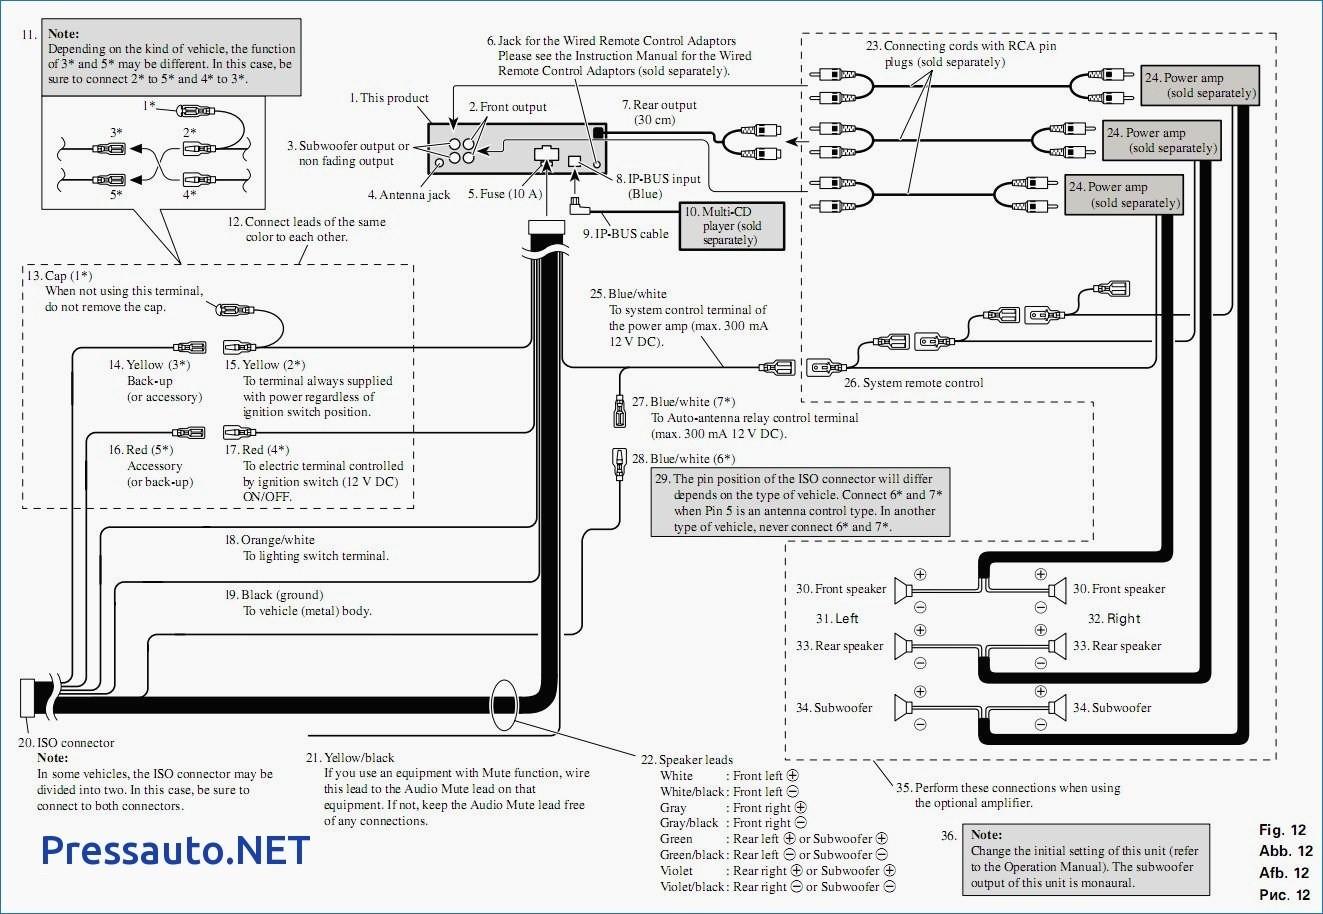 Pioneer Dxt X4869Bt Wiring Diagram | Wiring Diagram - Pioneer Dxt X4869Bt Wiring Diagram